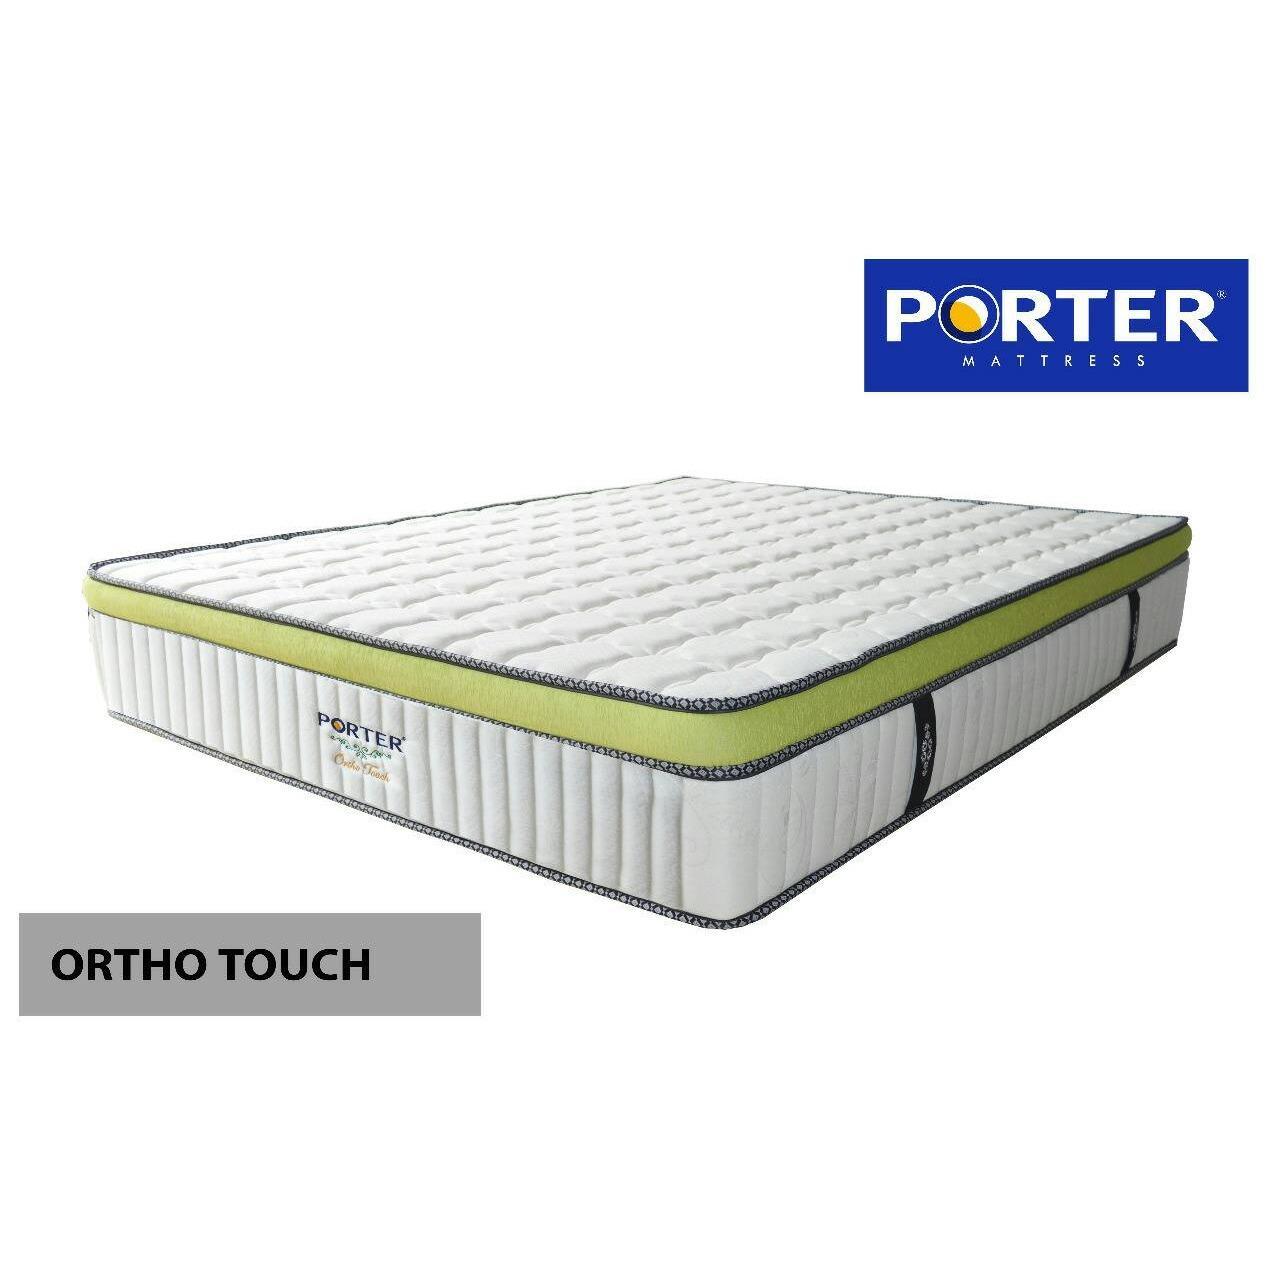 PORTER Spring Bed LATEX Ortho Touch Rebonded Mattress [JABODETABEK ONLY]